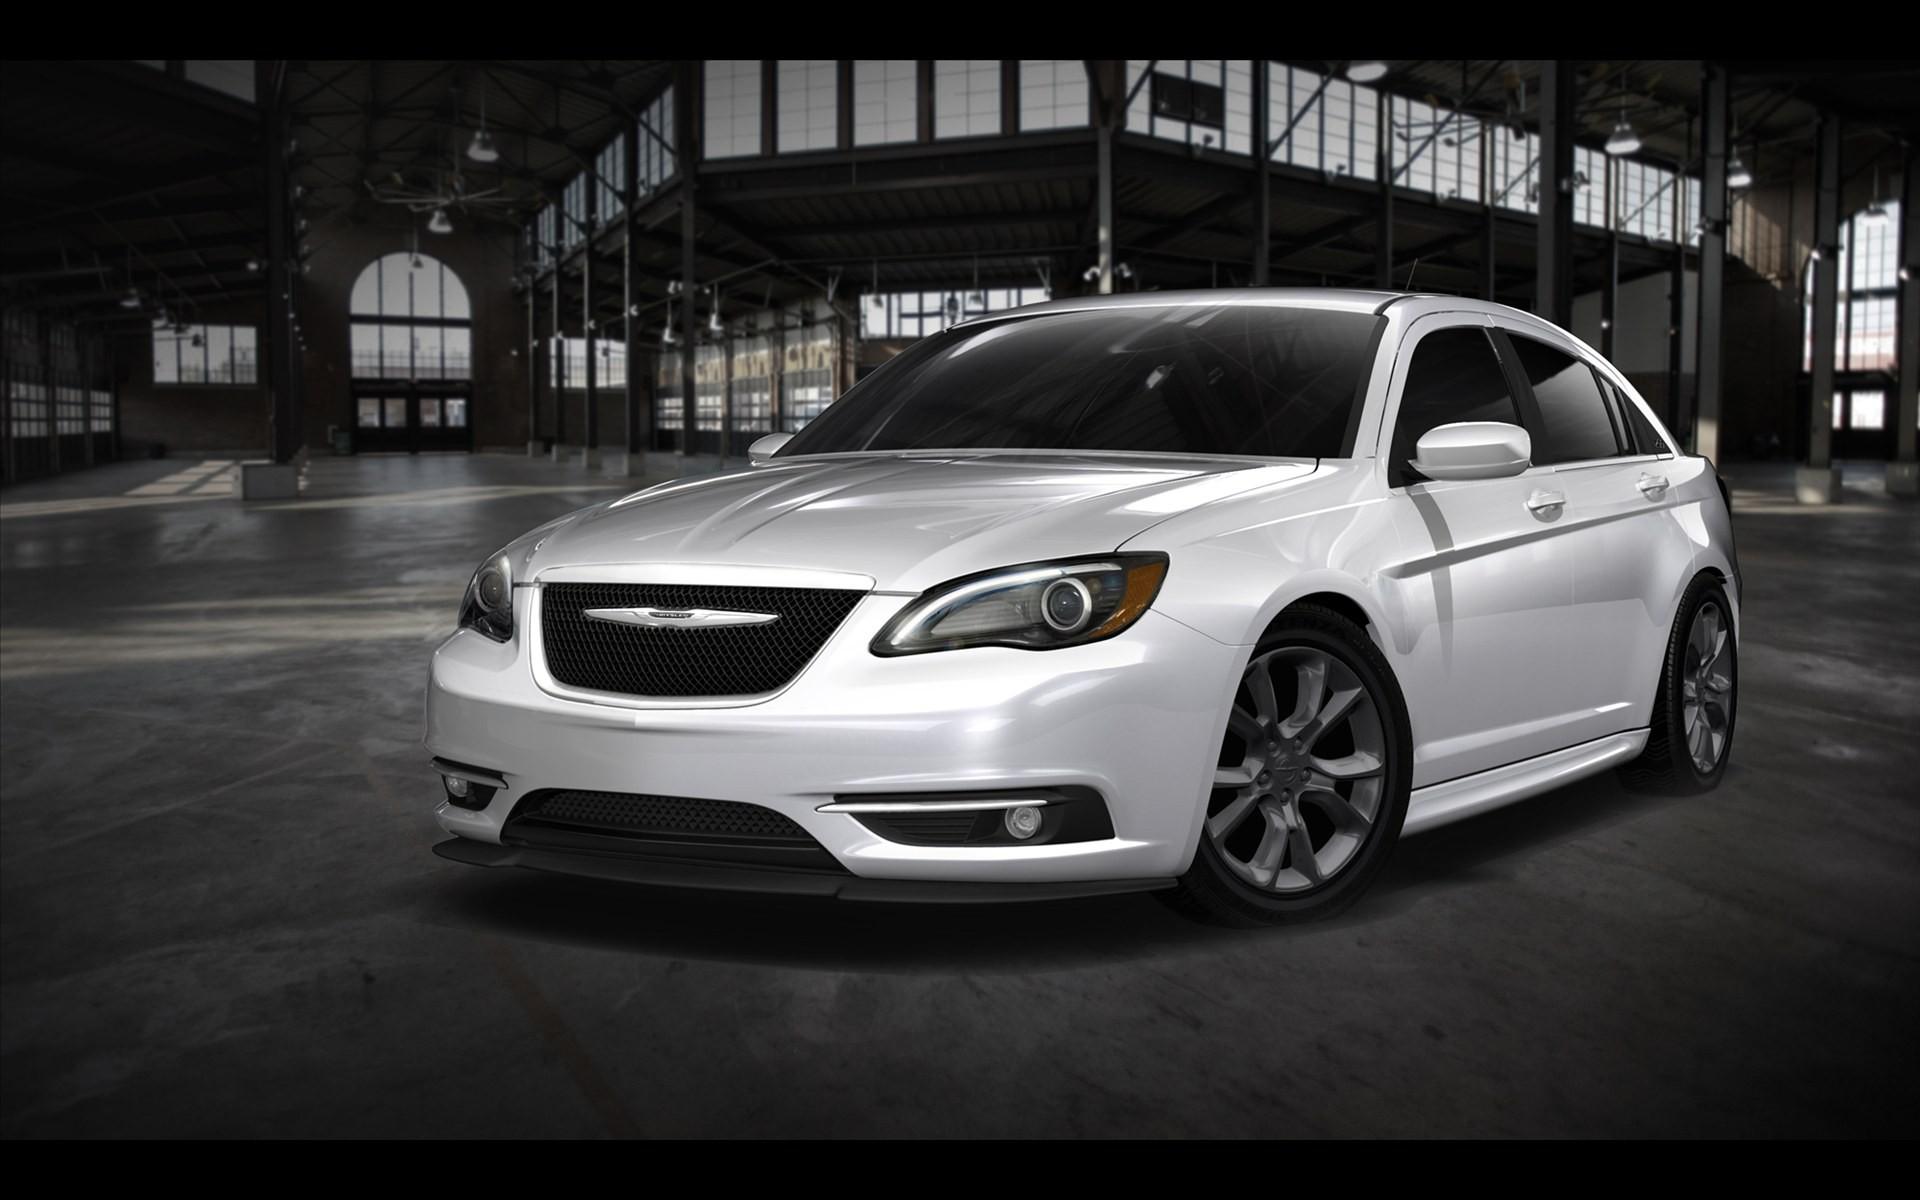 Chrysler Super S 2012 Wallpaper | HD Car Wallpapers | ID #2404